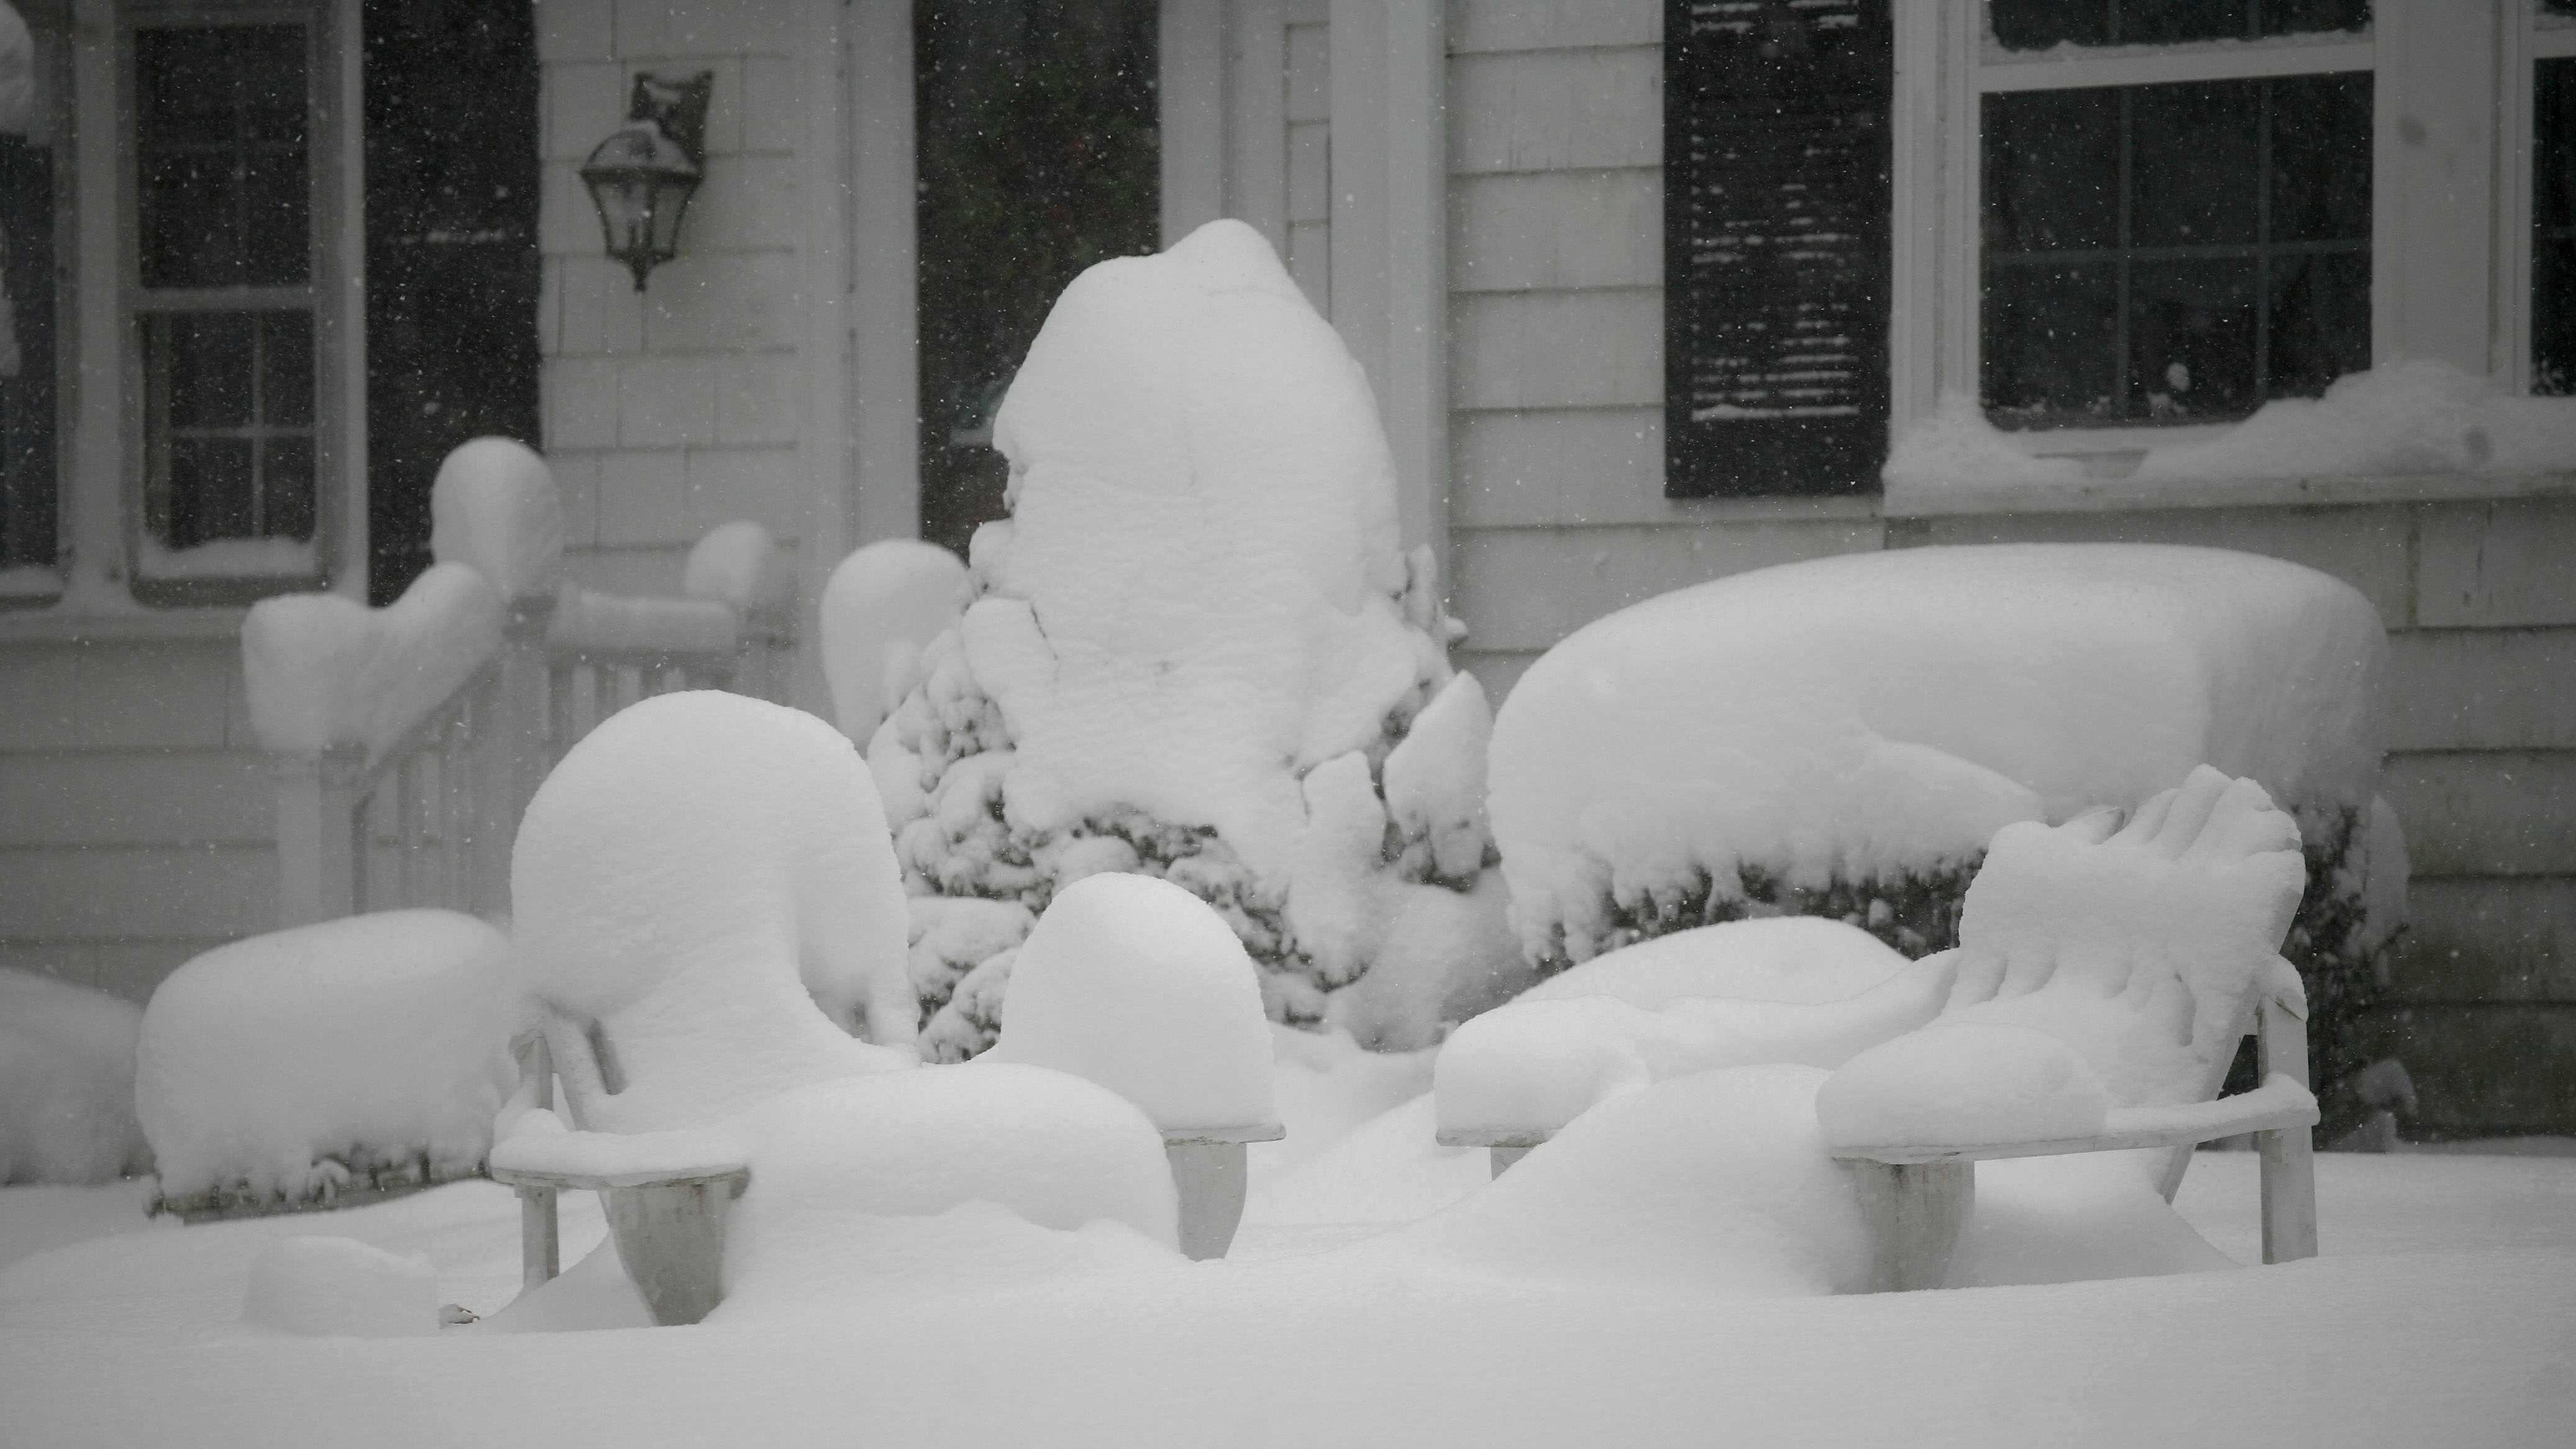 snow Marshfield gd 012214-03.JPG